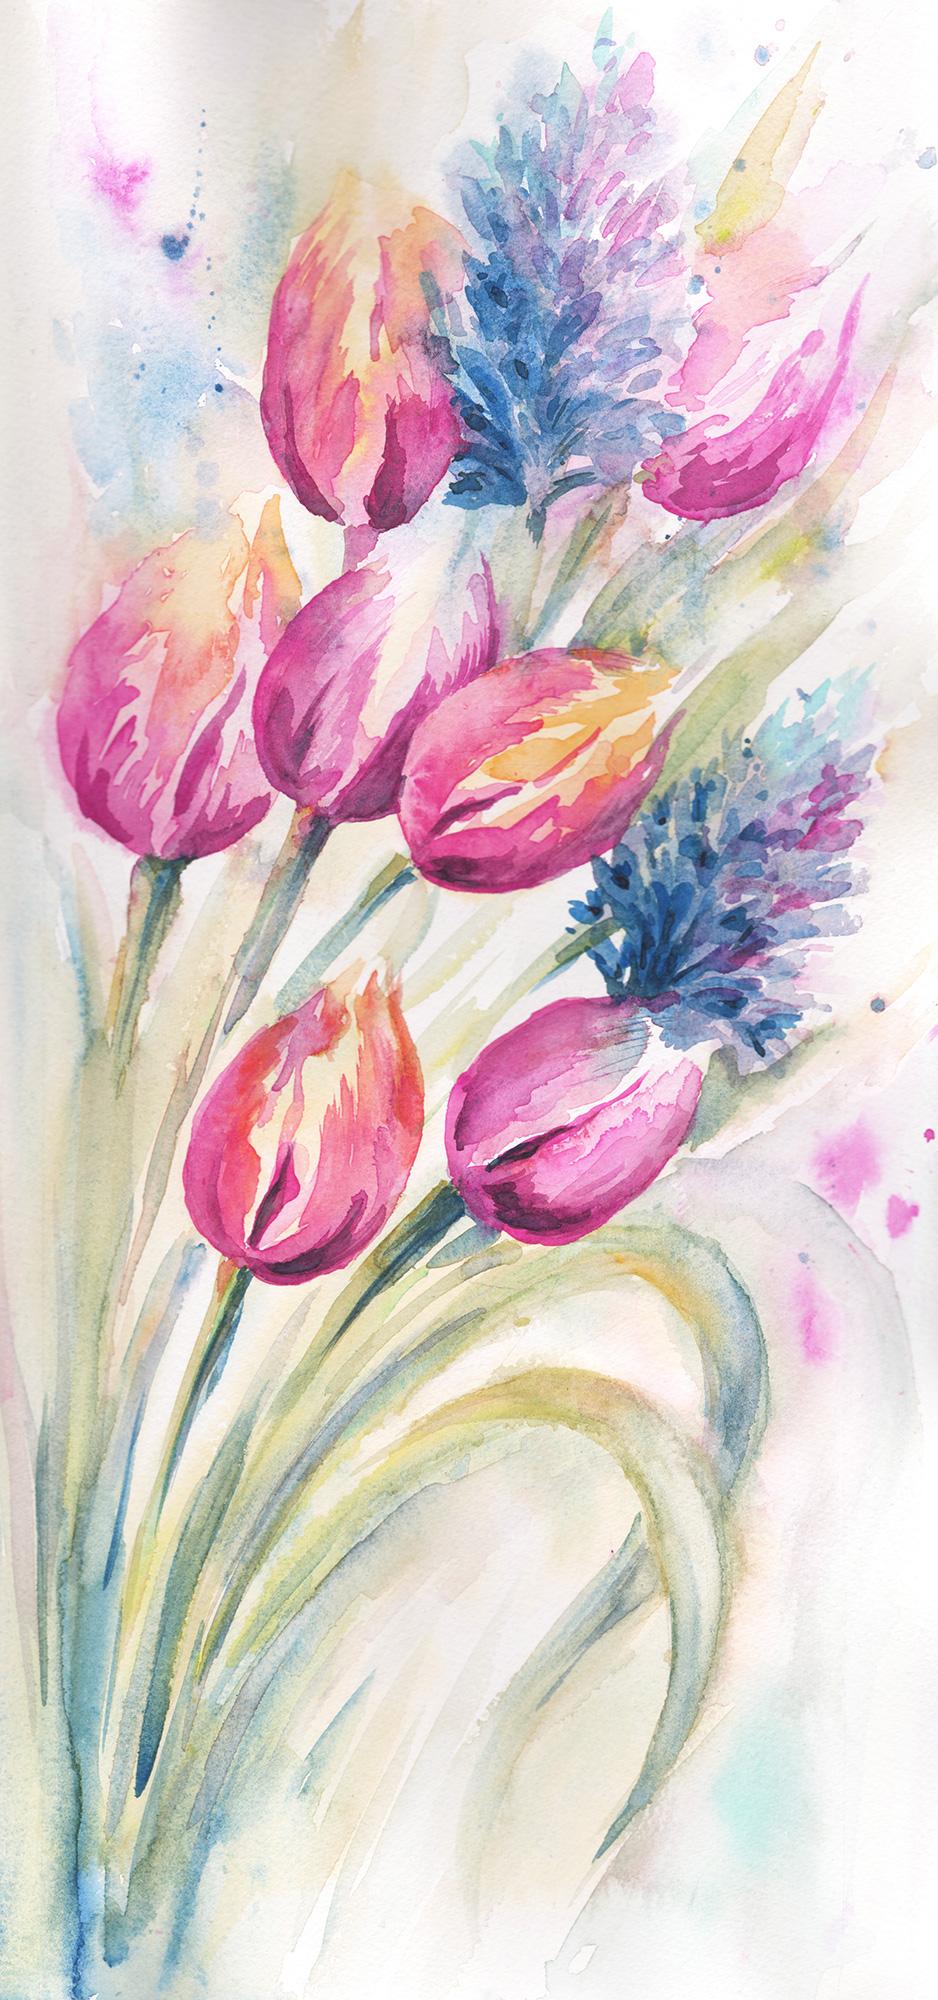 nicky-hunter-watercolour-painting-spring-tulips.jpg